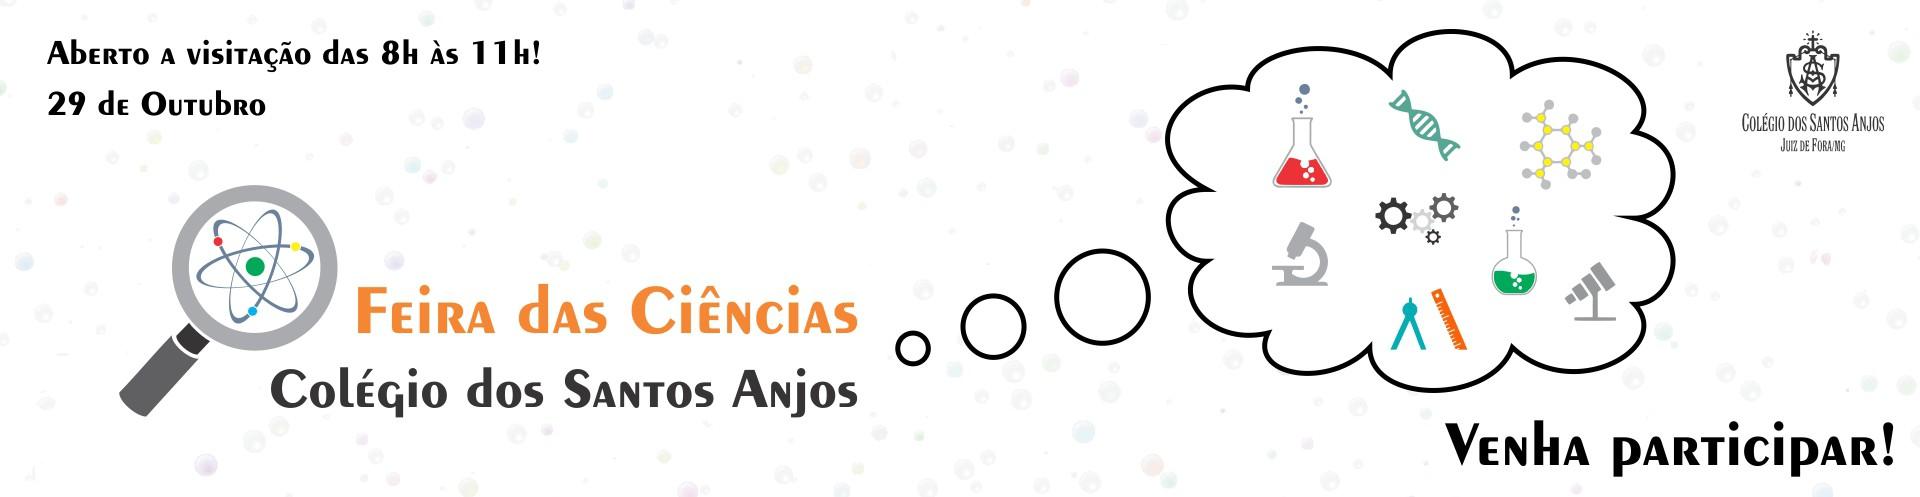 20161024_web_feiradasciencias_banner